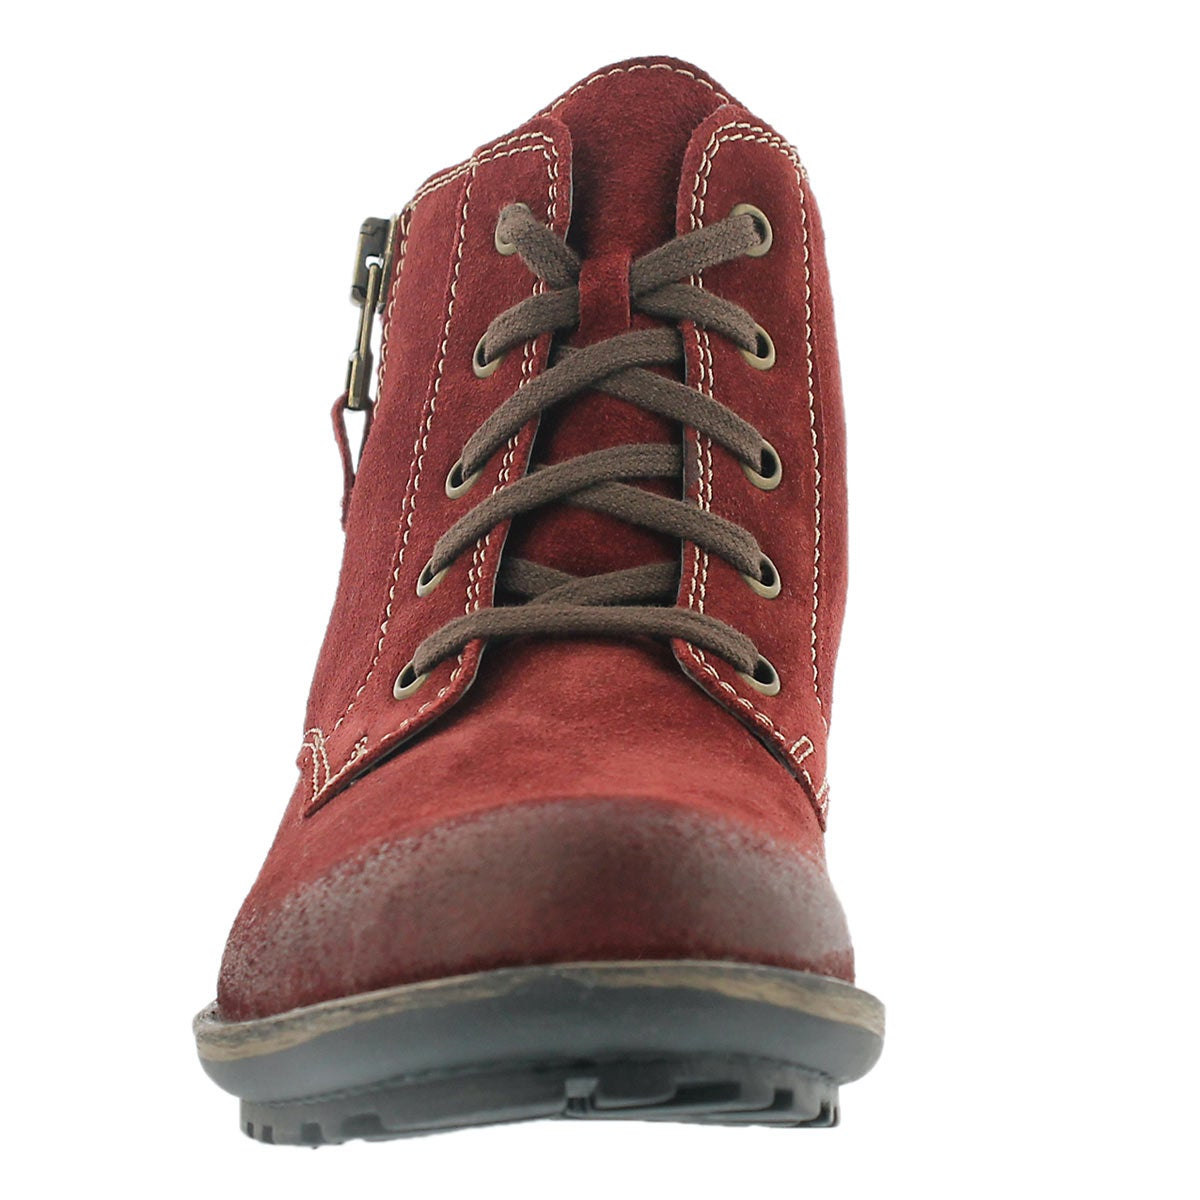 Lds Sandra 28 carmin ankle boot